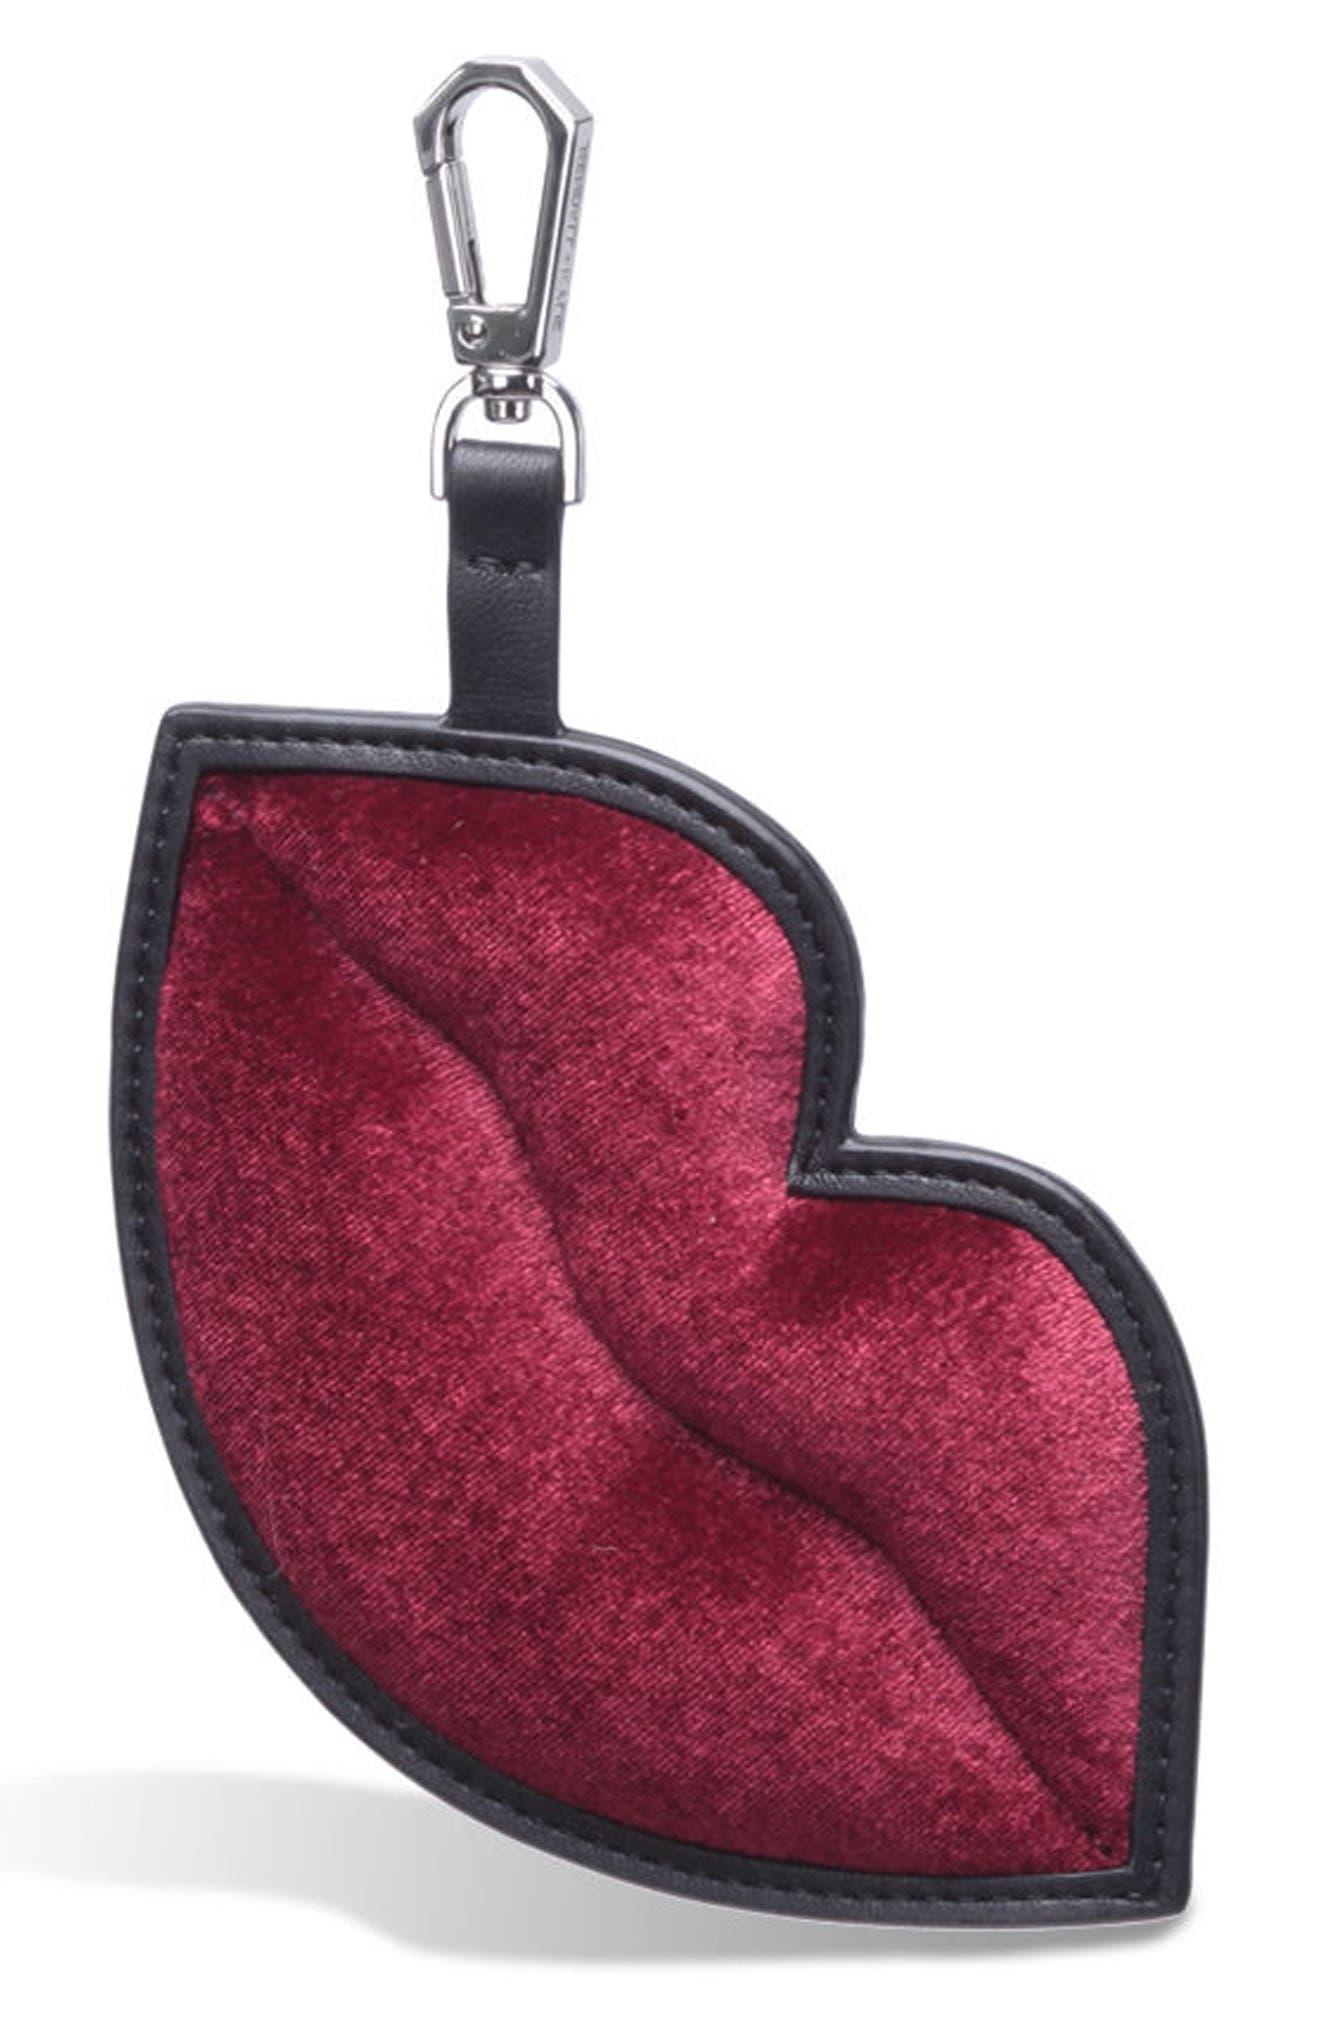 Main Image - KENDALL + KYLIE Lush Lips Bag Charm